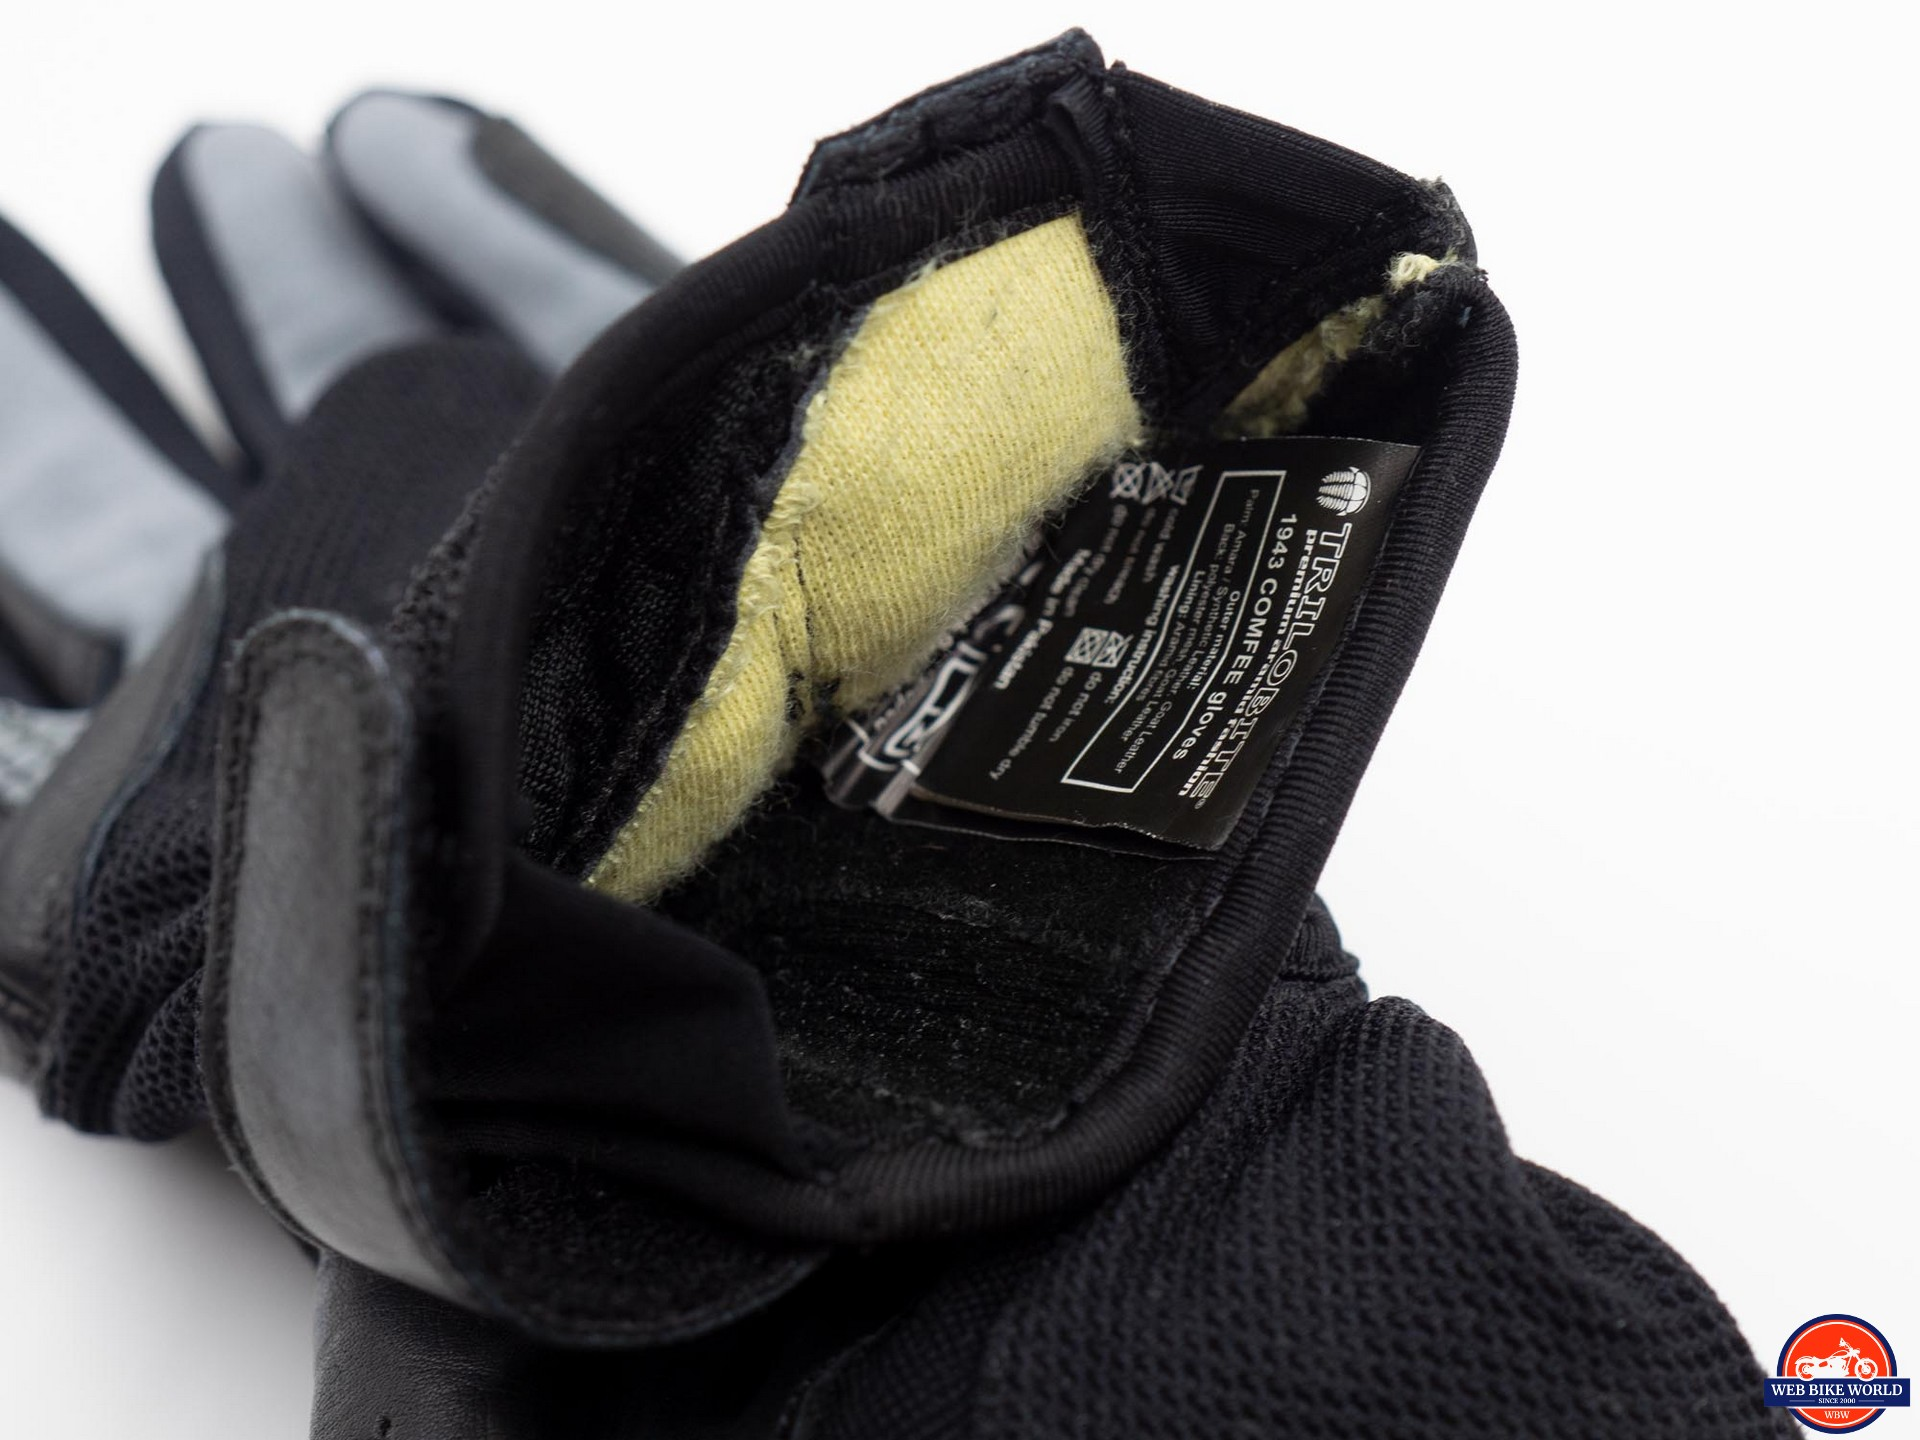 Trilobite Comfee Gloves care instructions inside cuff